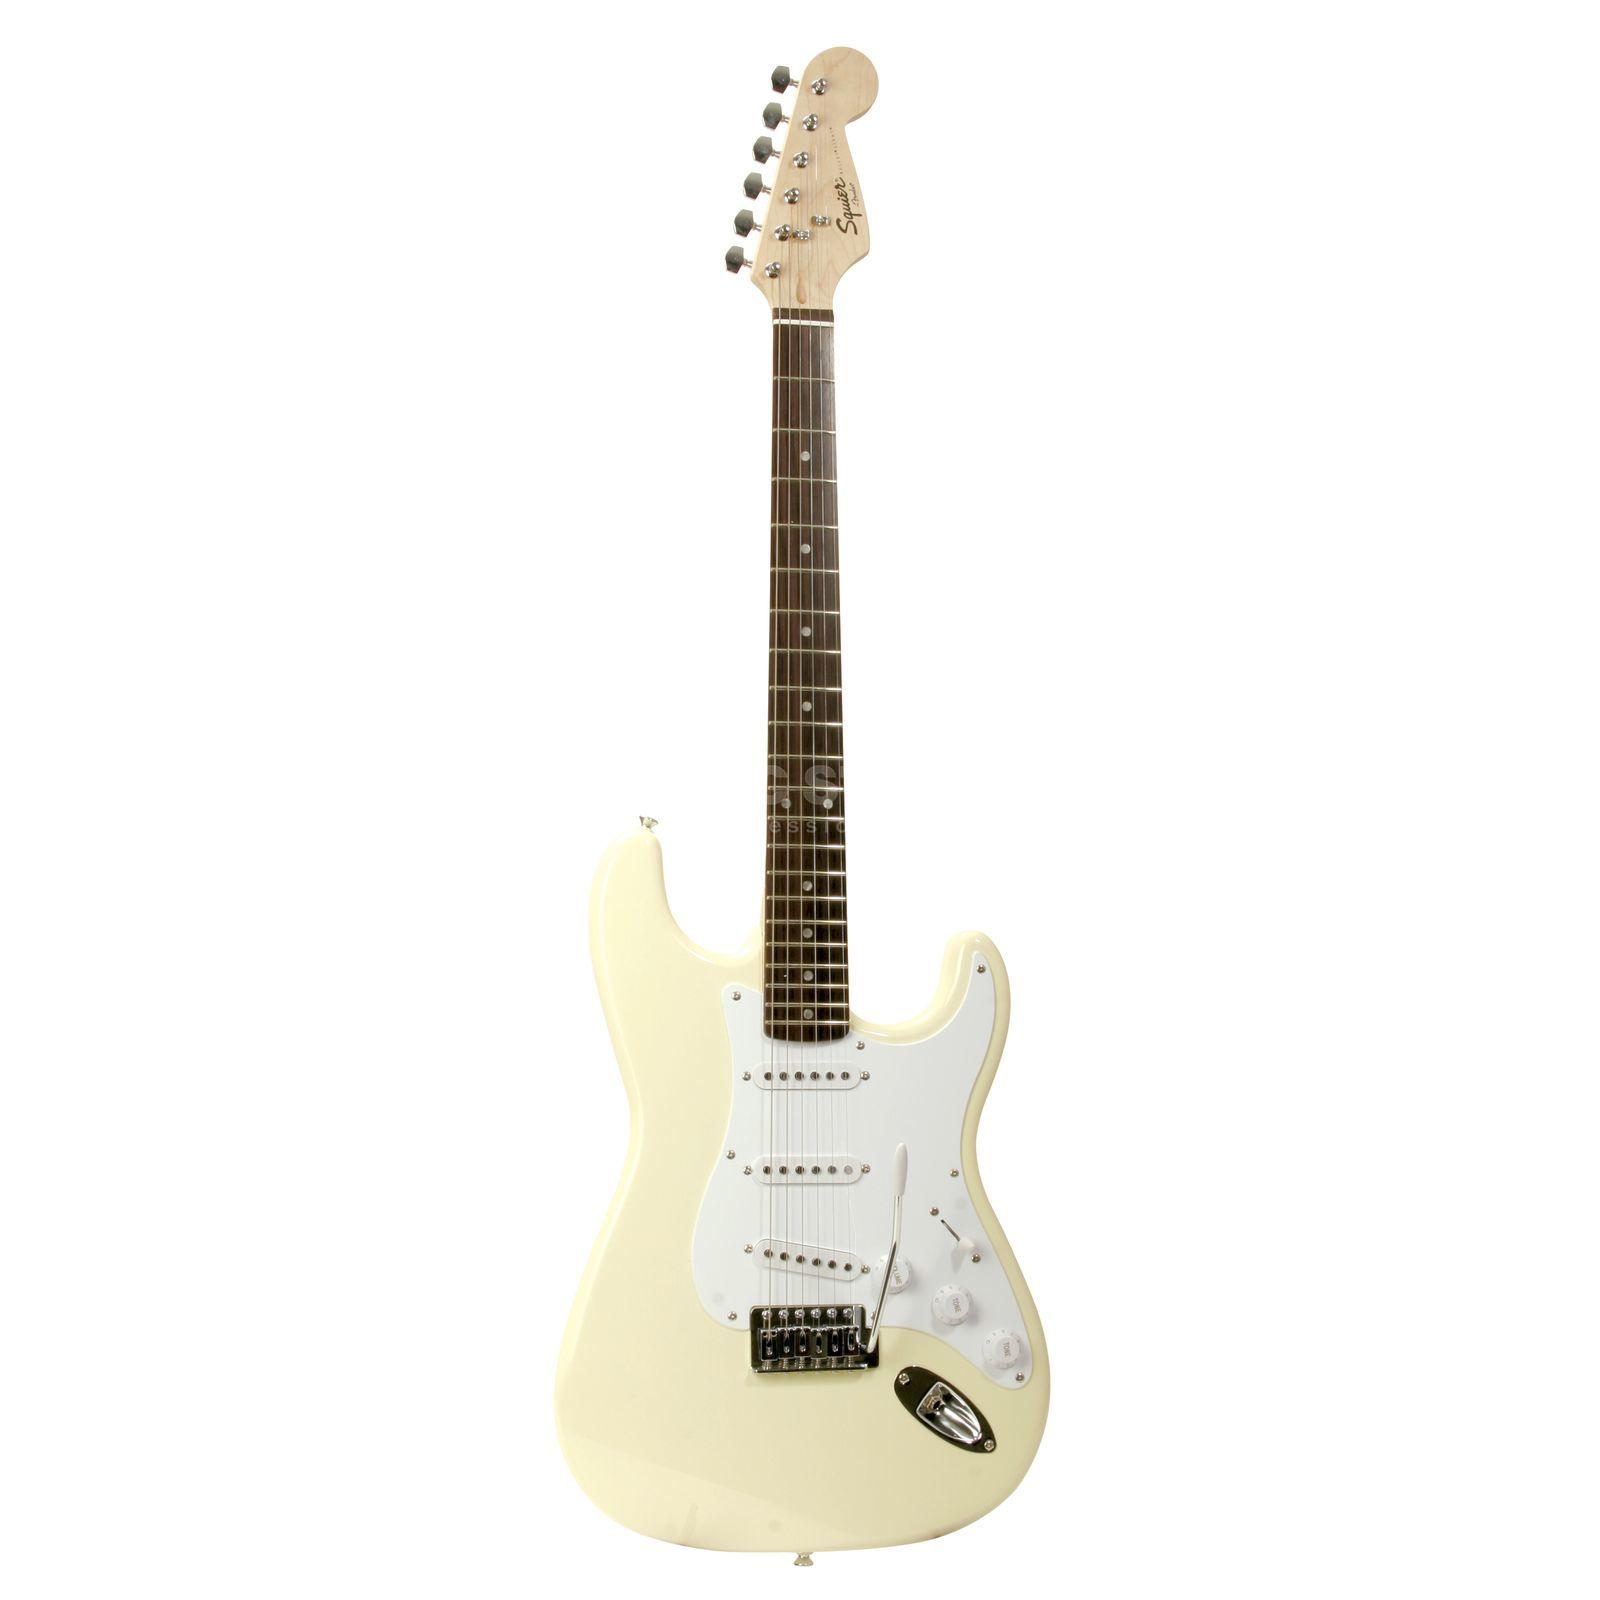 Archiwalne Fender American Vine Reissue 62 Jaguar 2001 W